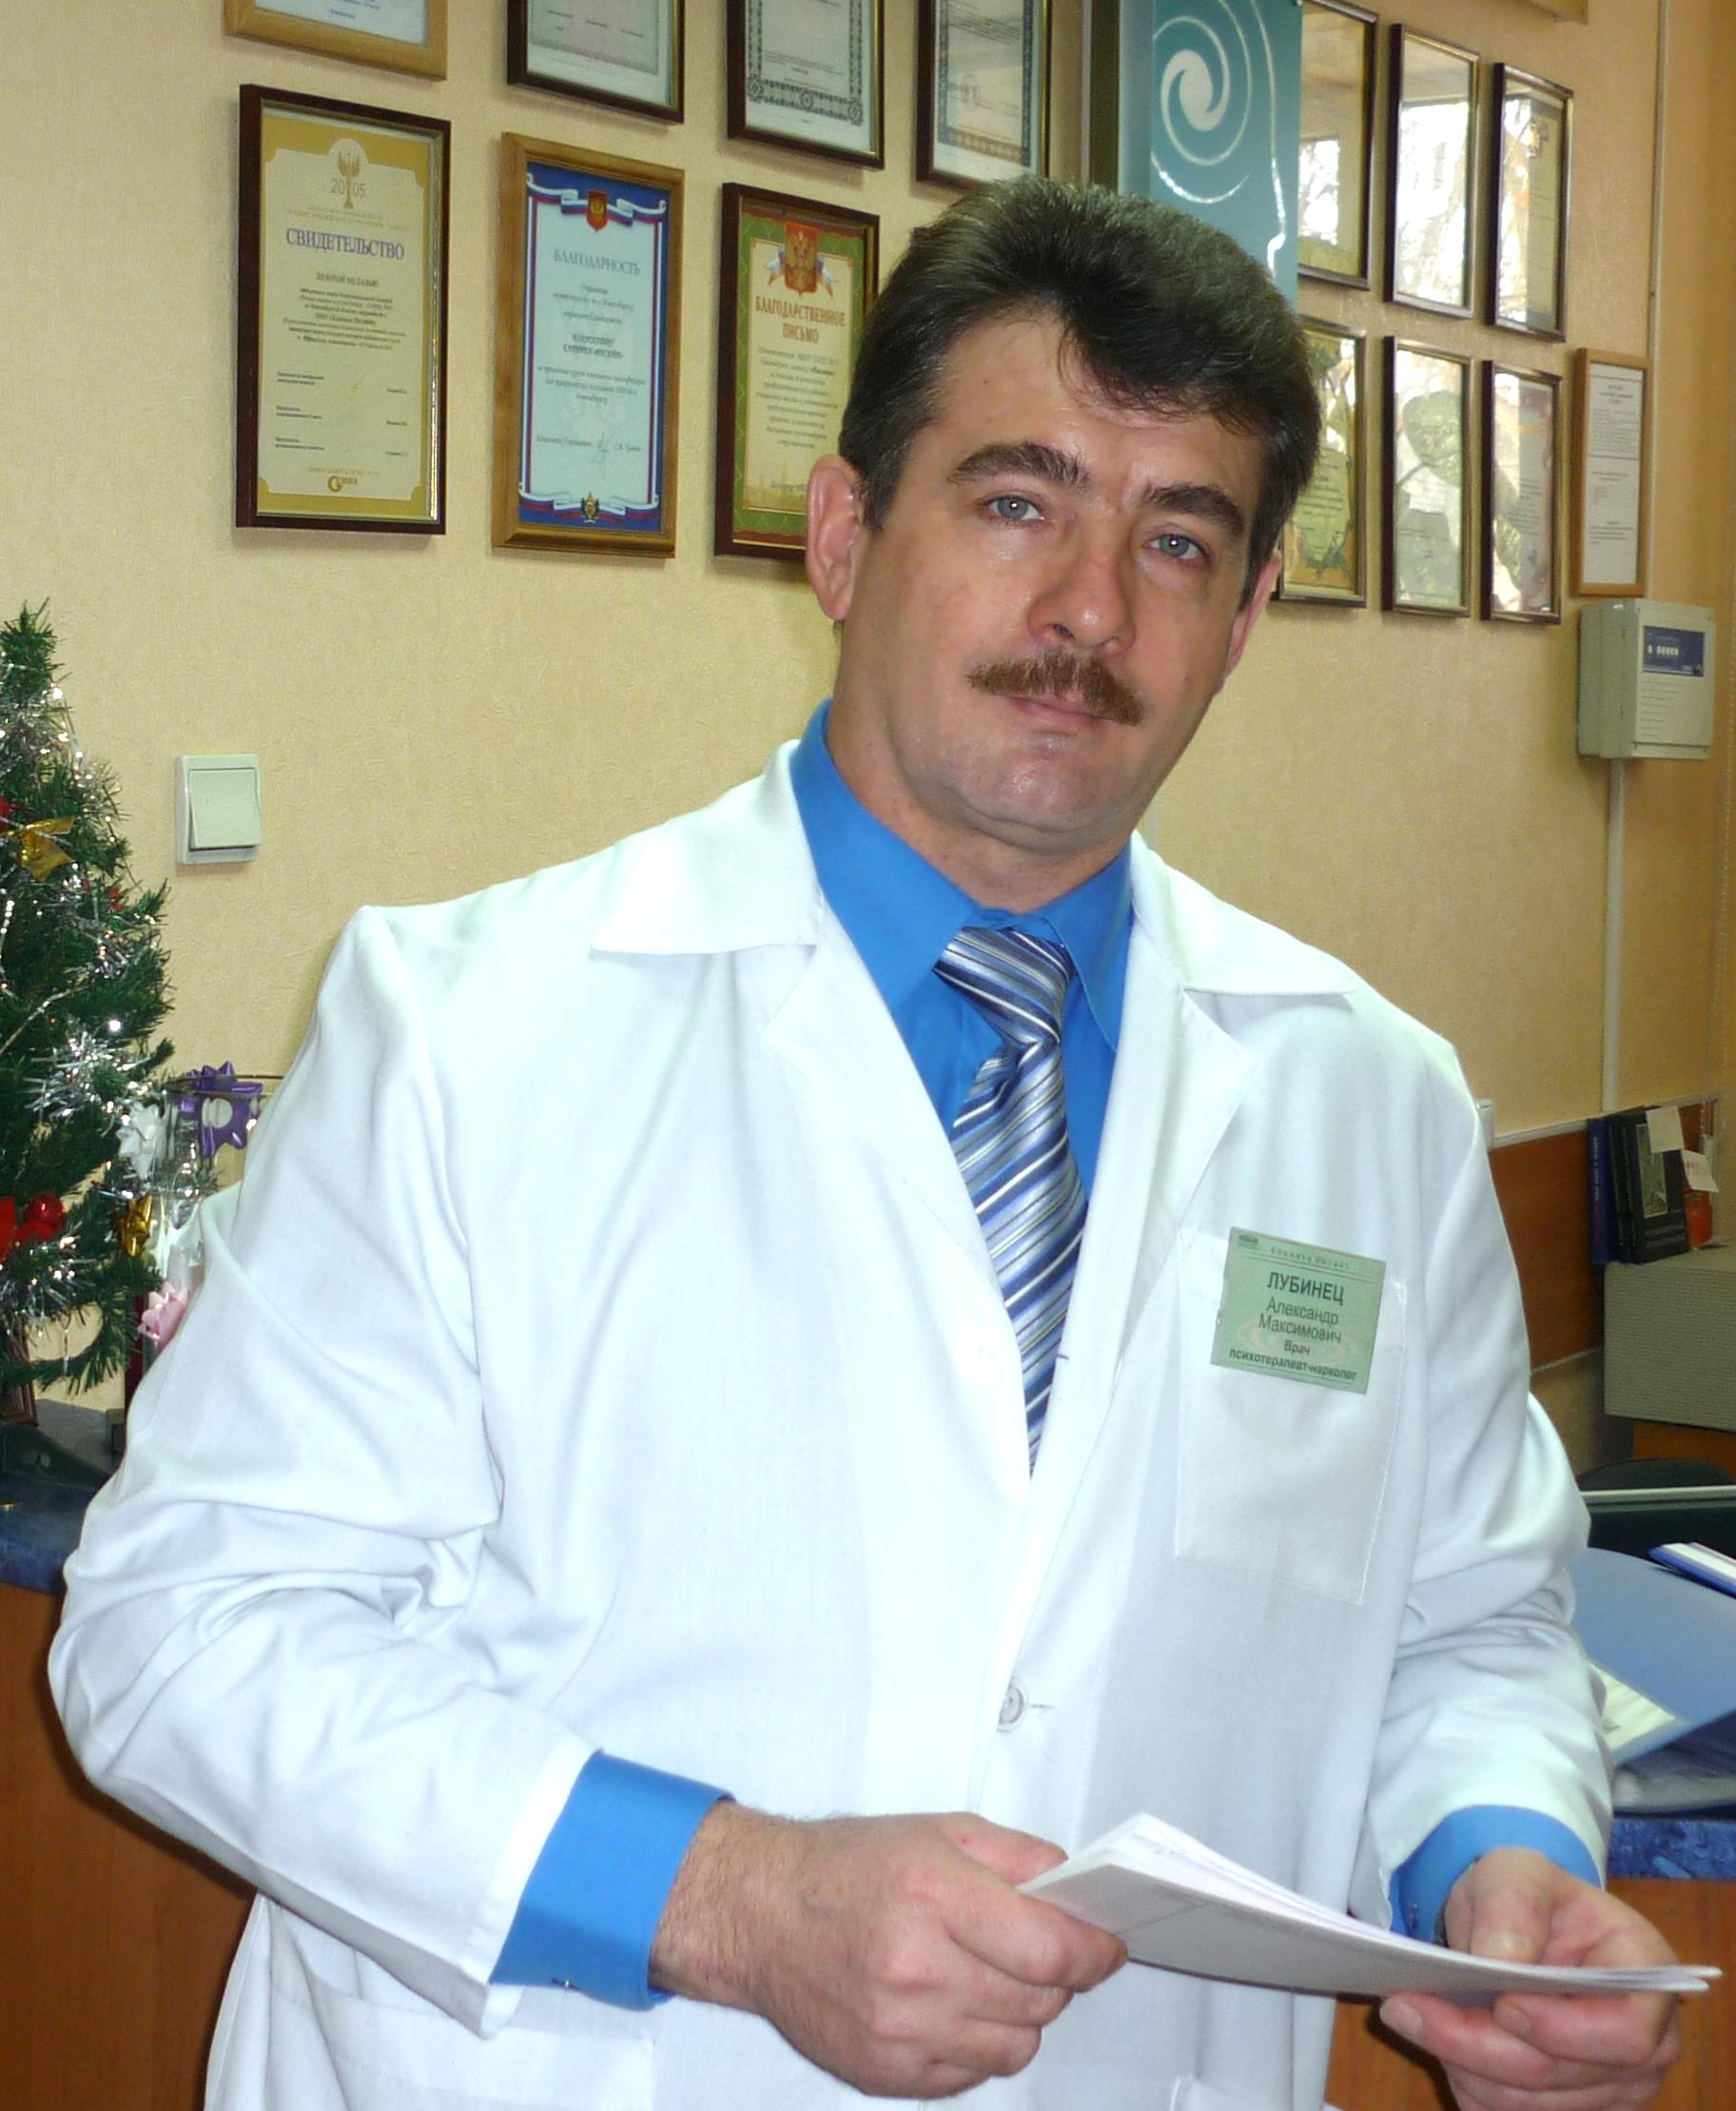 врач психиатр, нарколог, психотерапевт